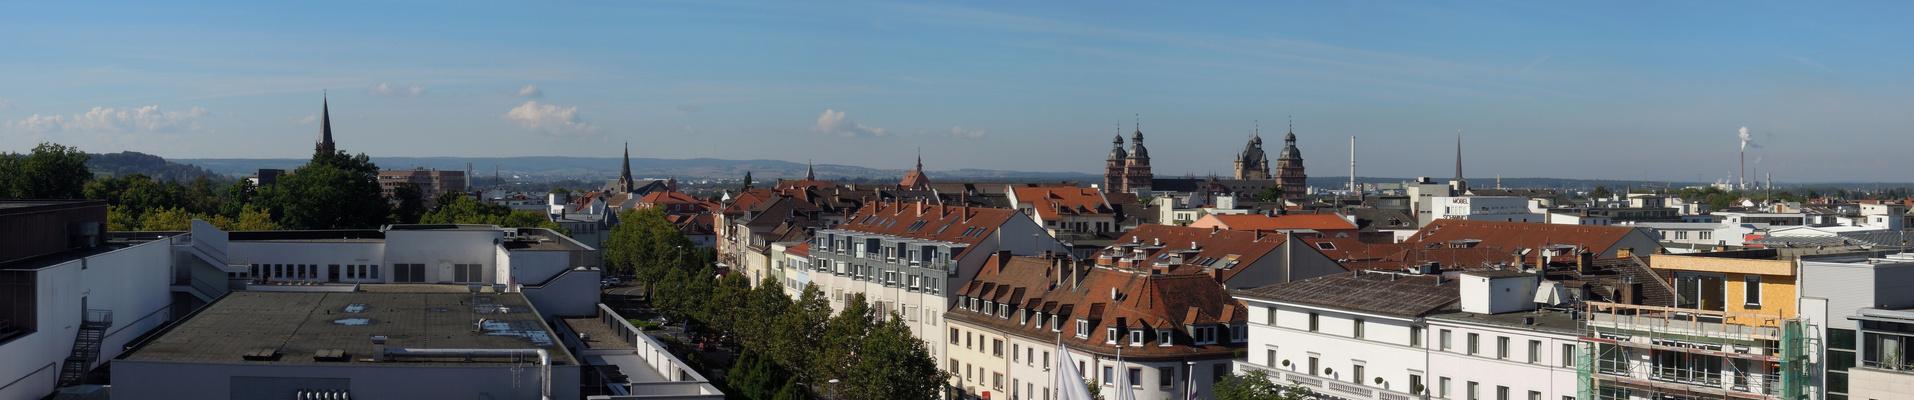 Panorama Aschaffenburg